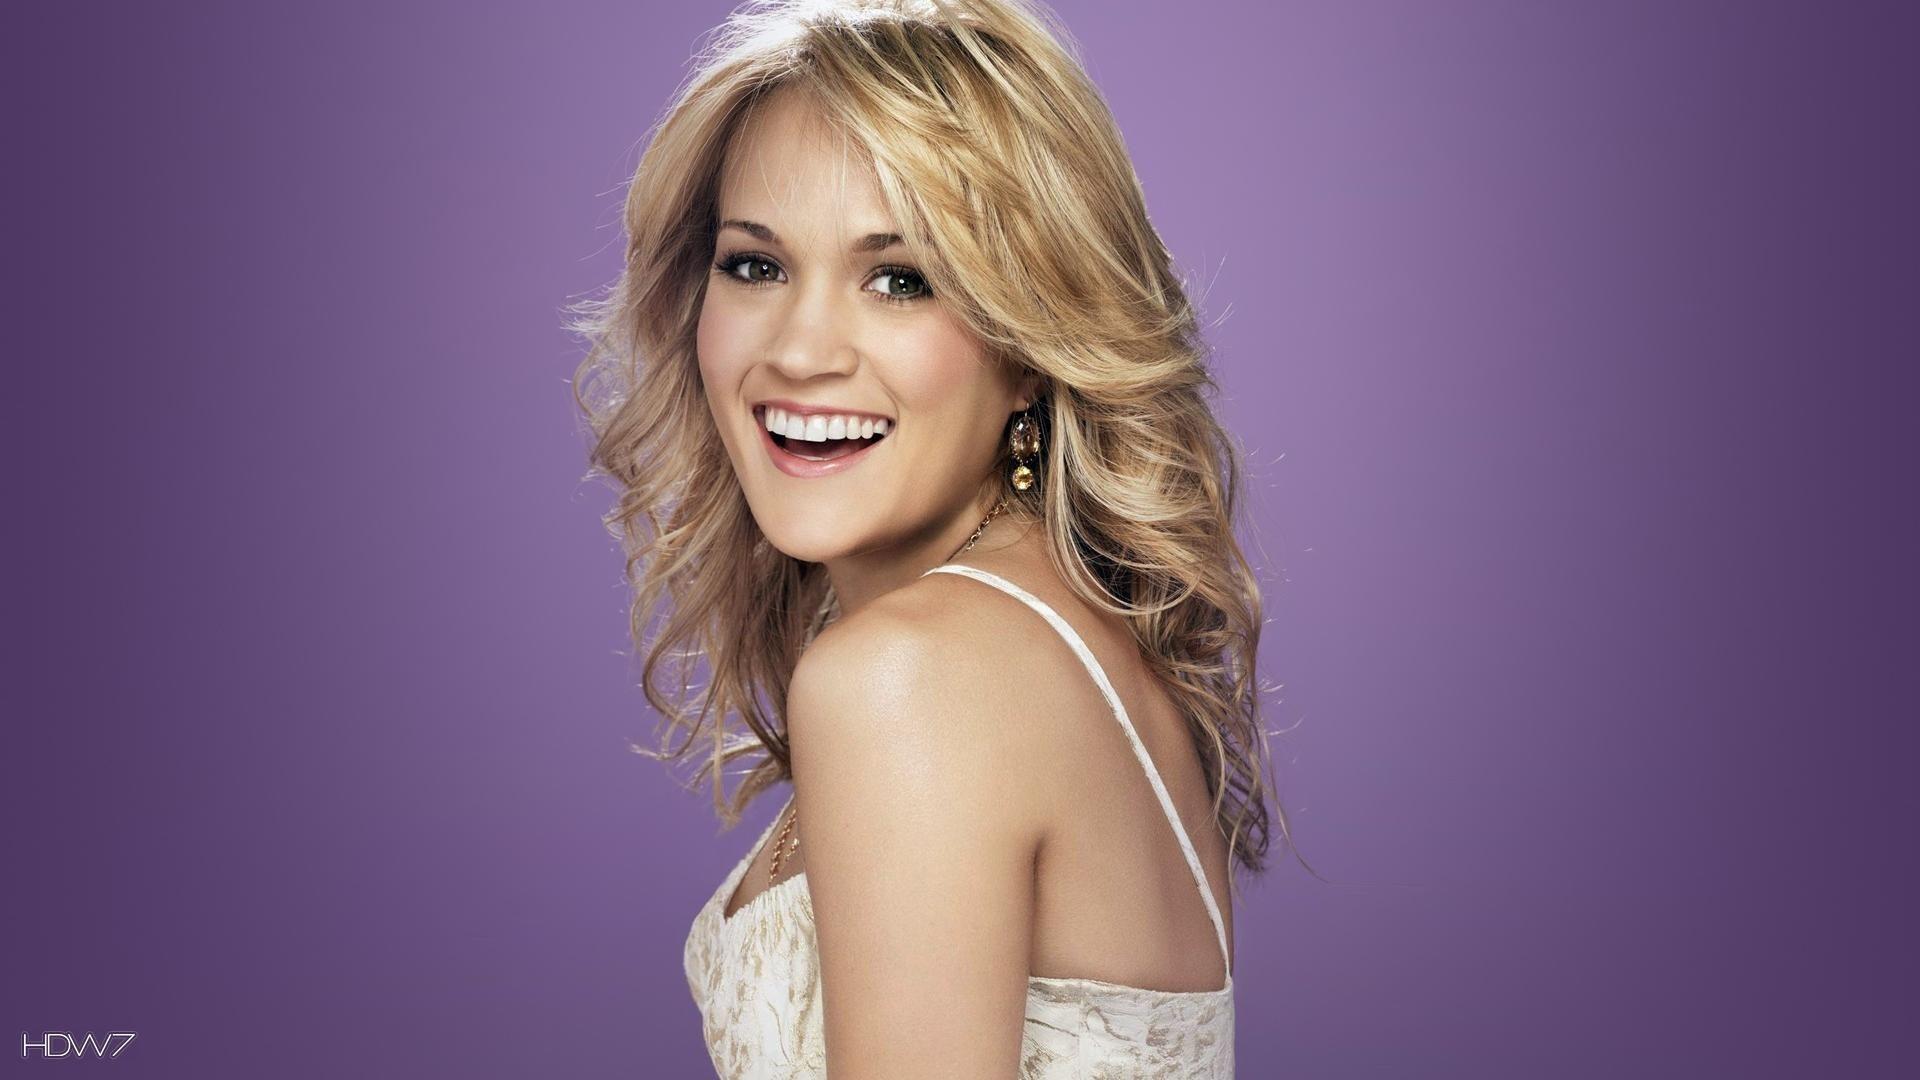 Carrie Underwood HD Wallpaper Download